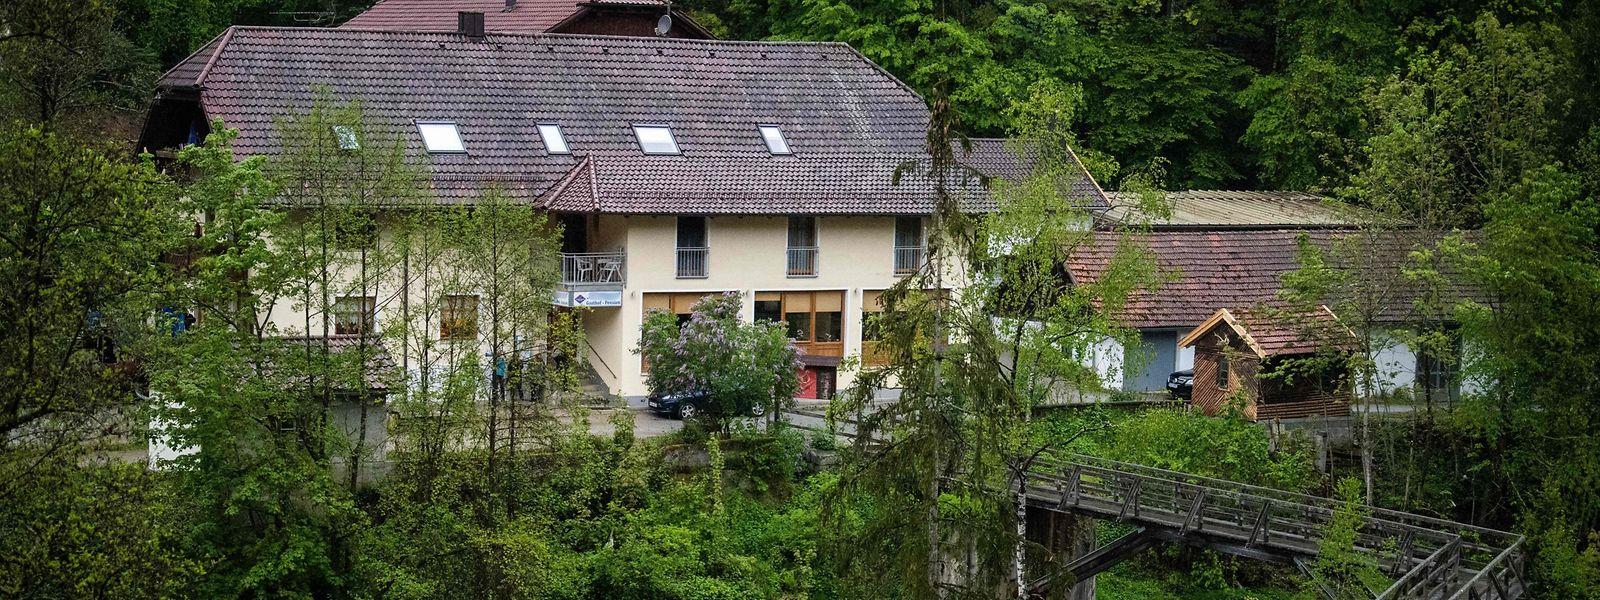 Die Pension liegt am Ufer des Flusses Ilz in Passau.